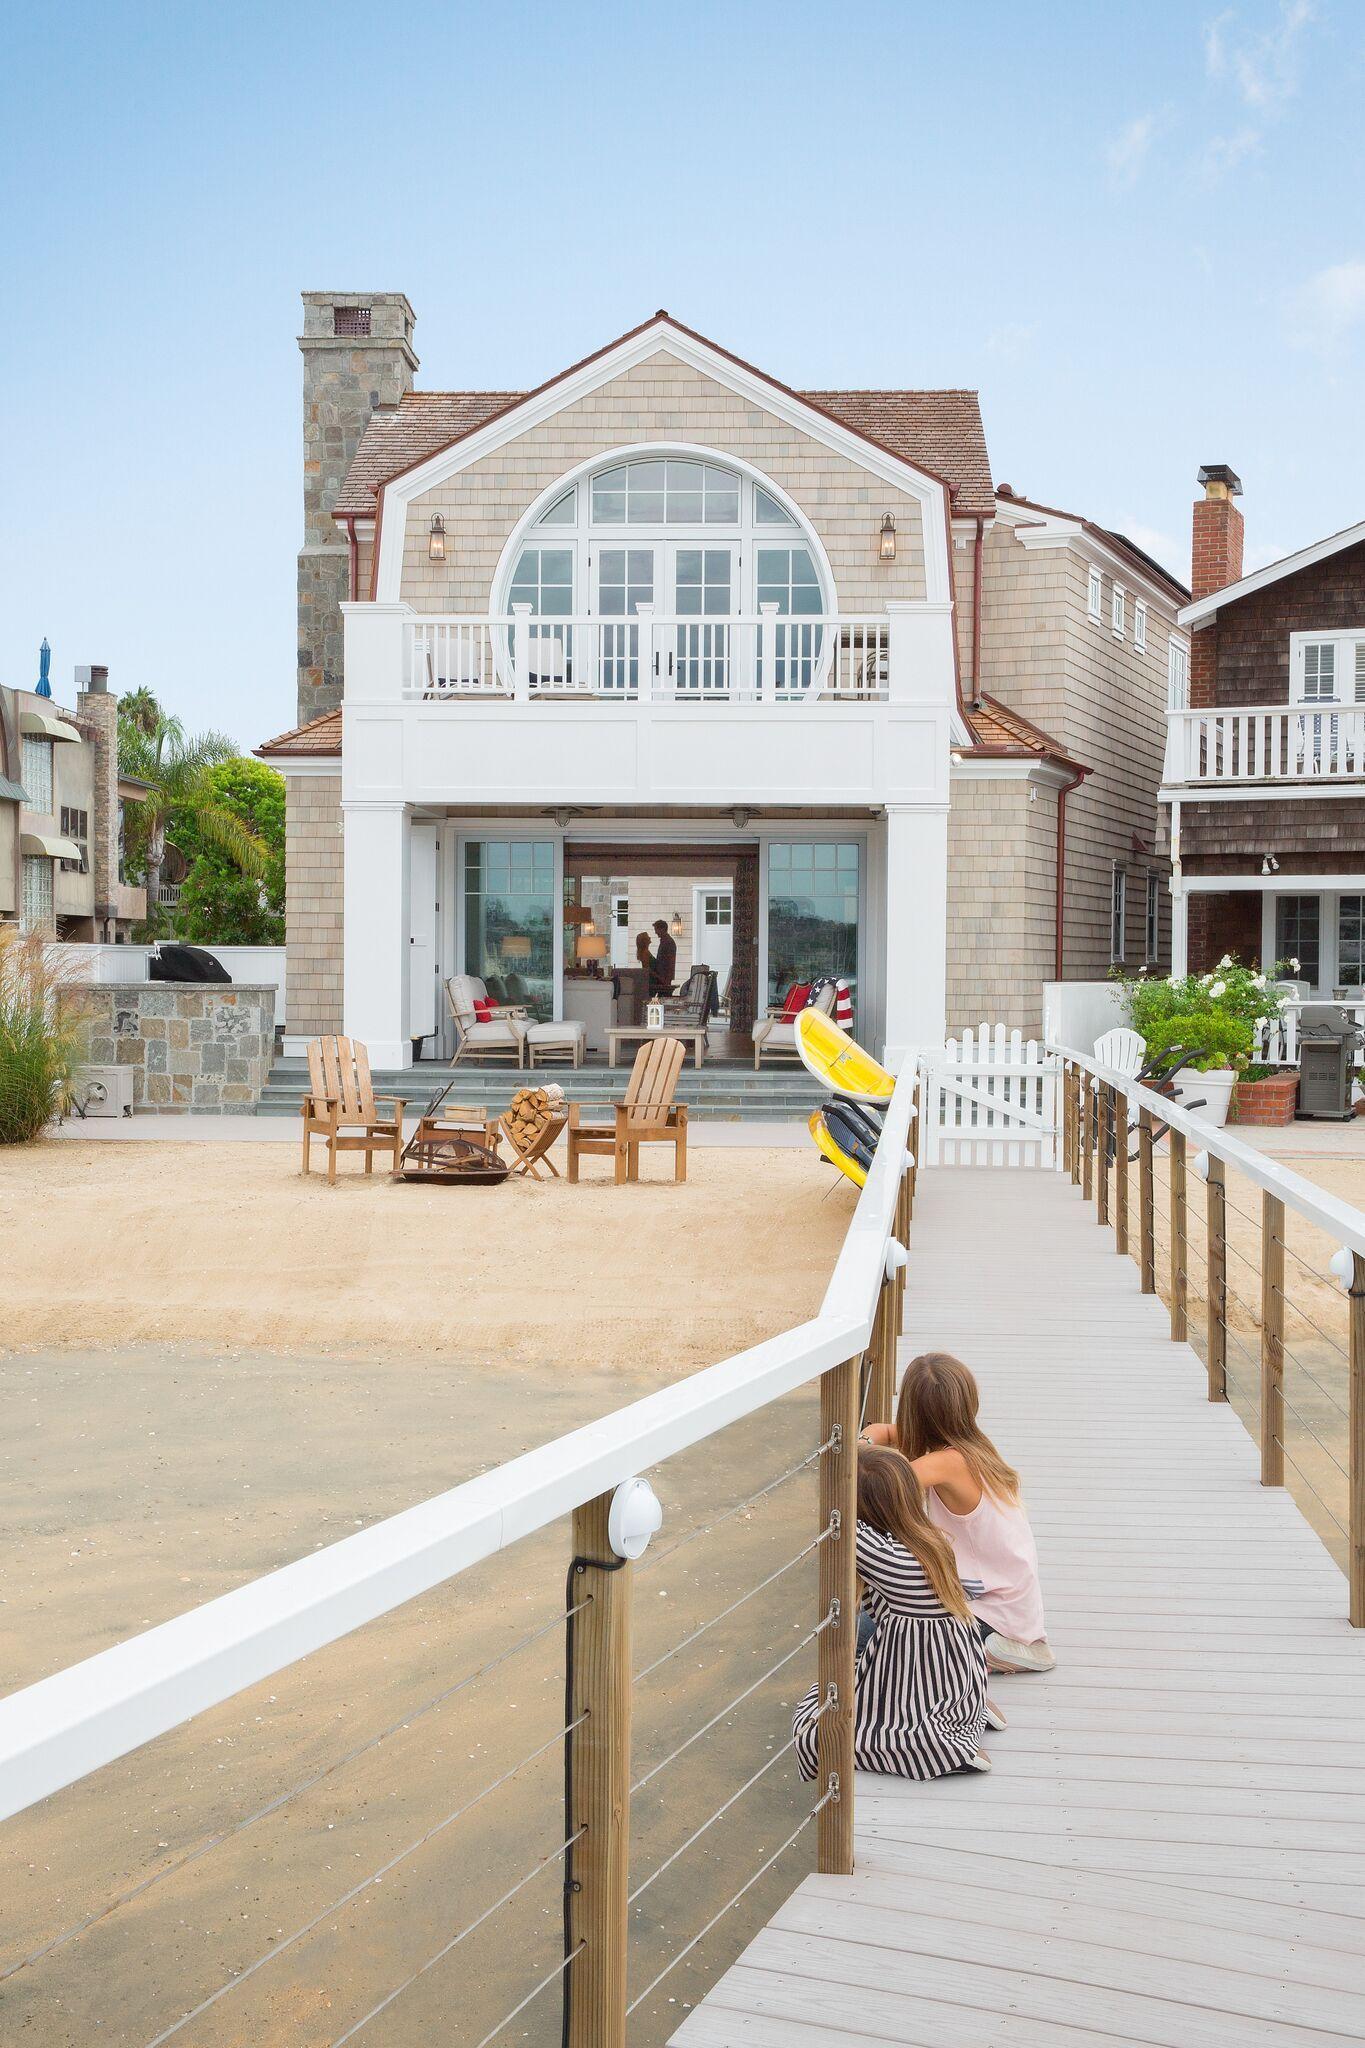 Balboa Beach House California On A Small Lot With Dock